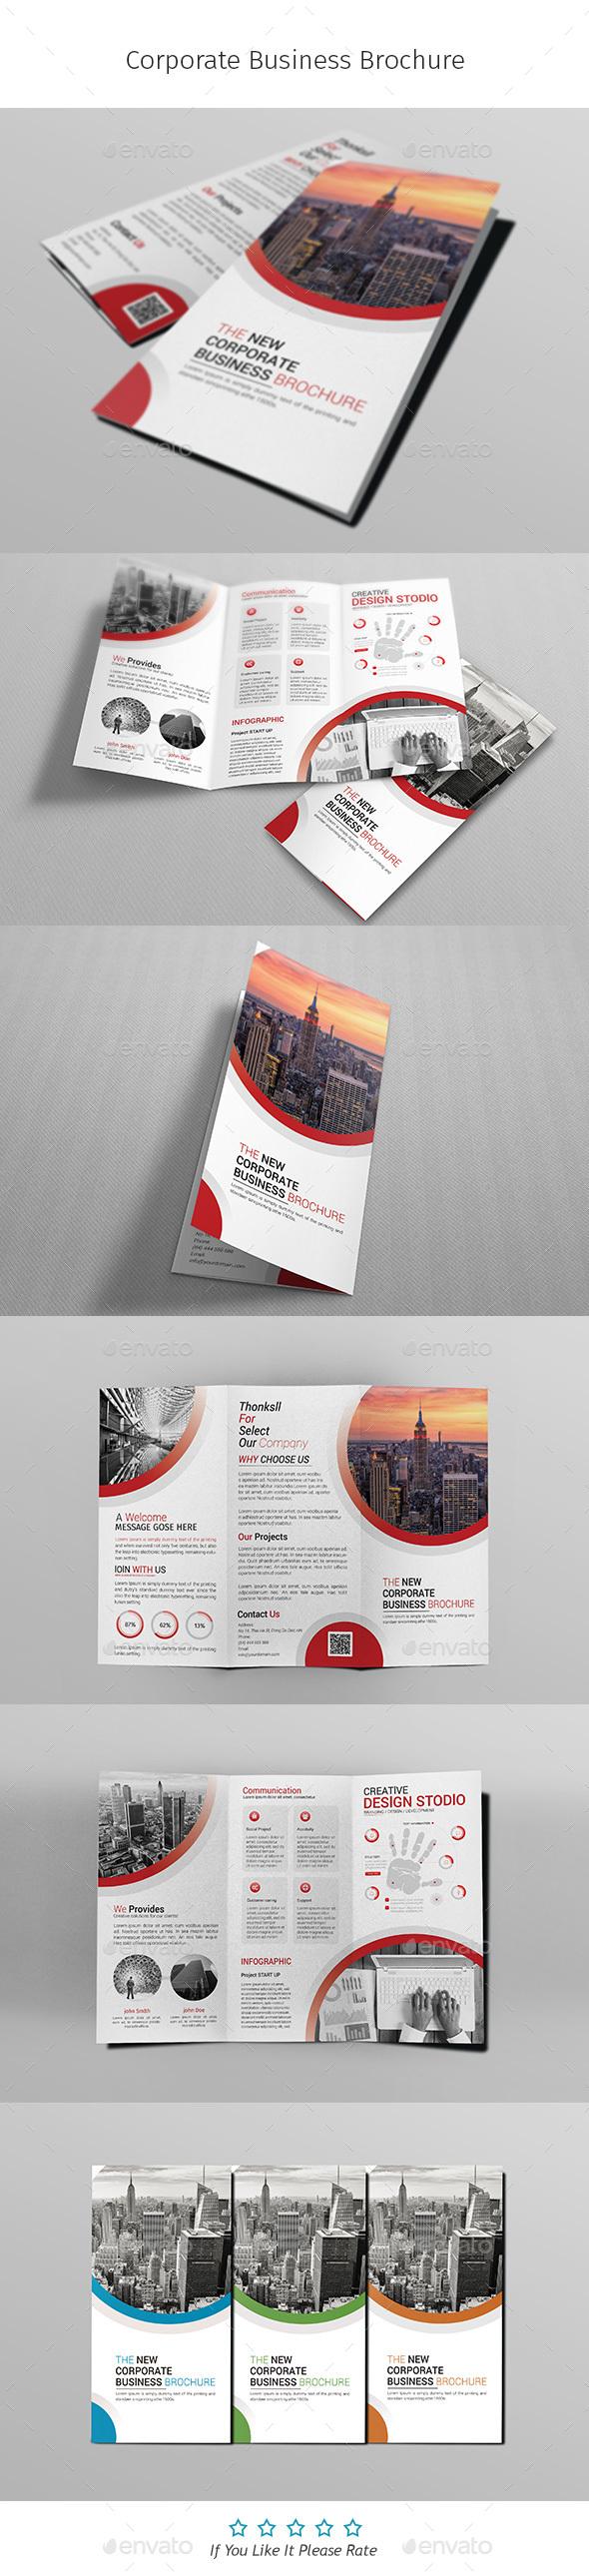 A4 Corporate Business Flyer Template Vol 03 - Corporate Brochures